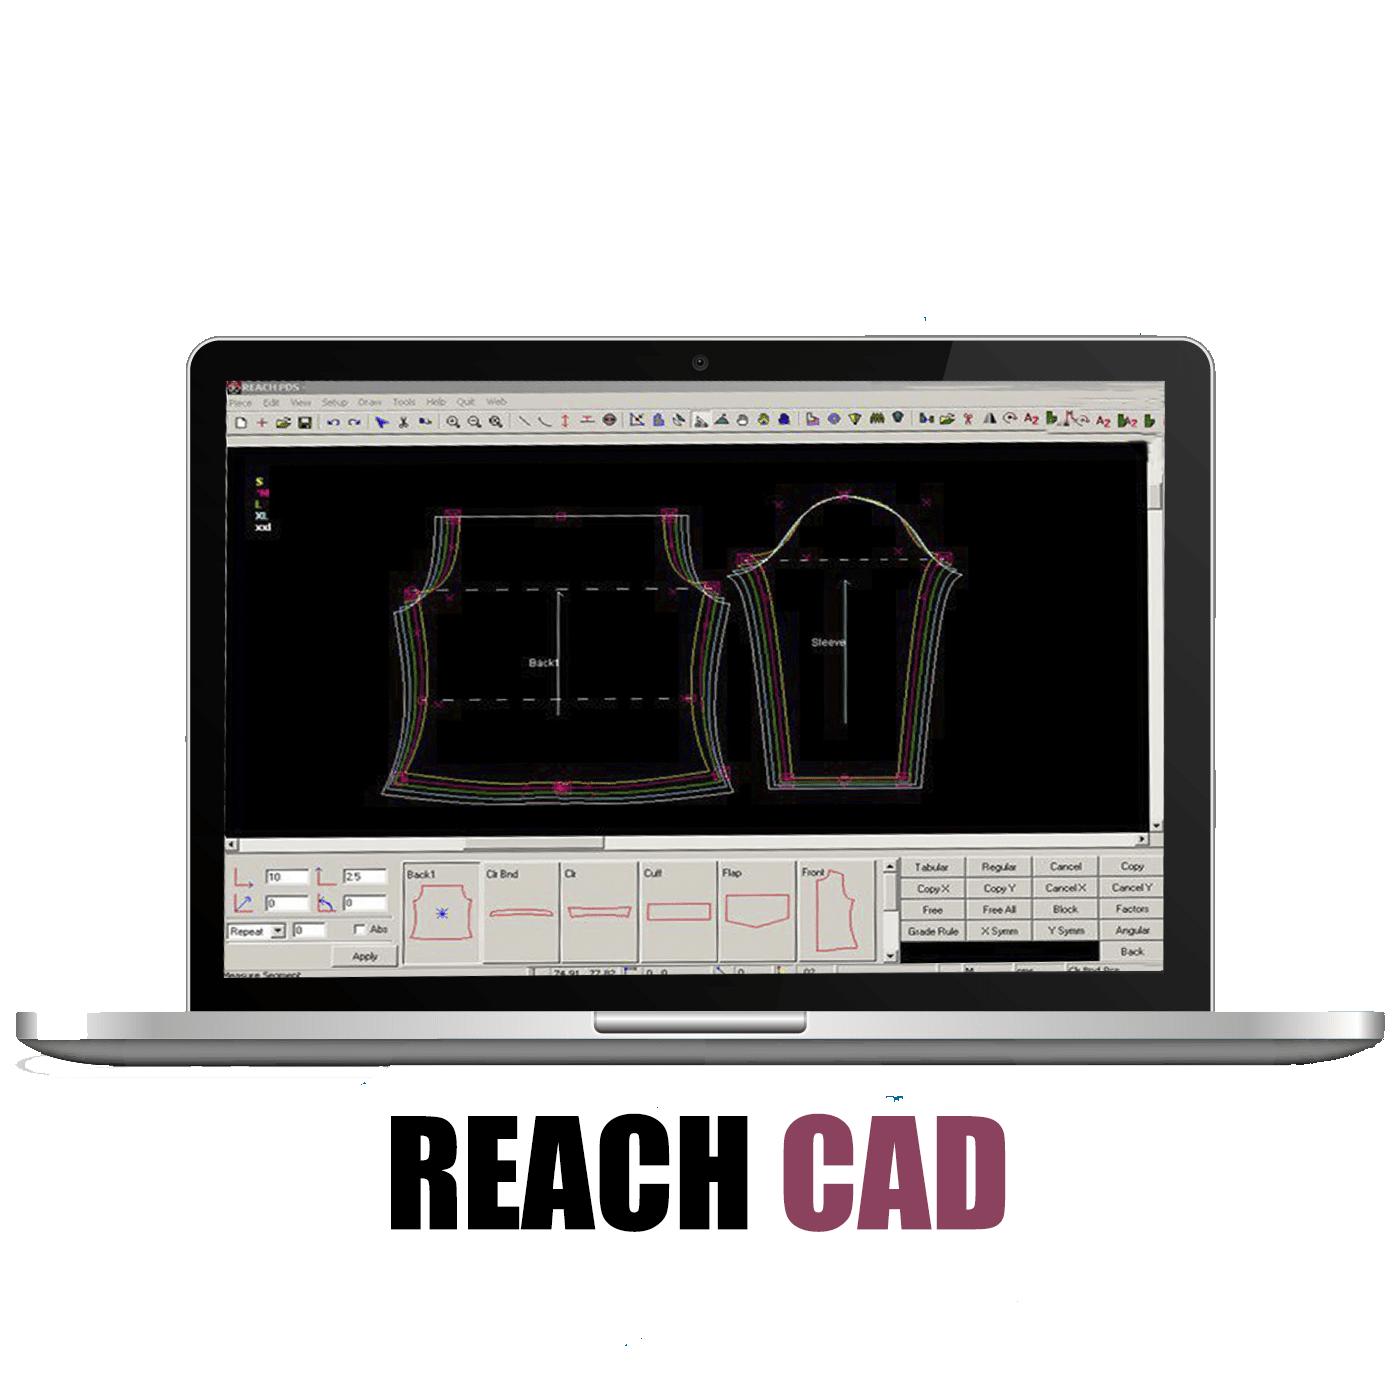 Apparel Garment Clothing Fashion Cad Software Reach Cad